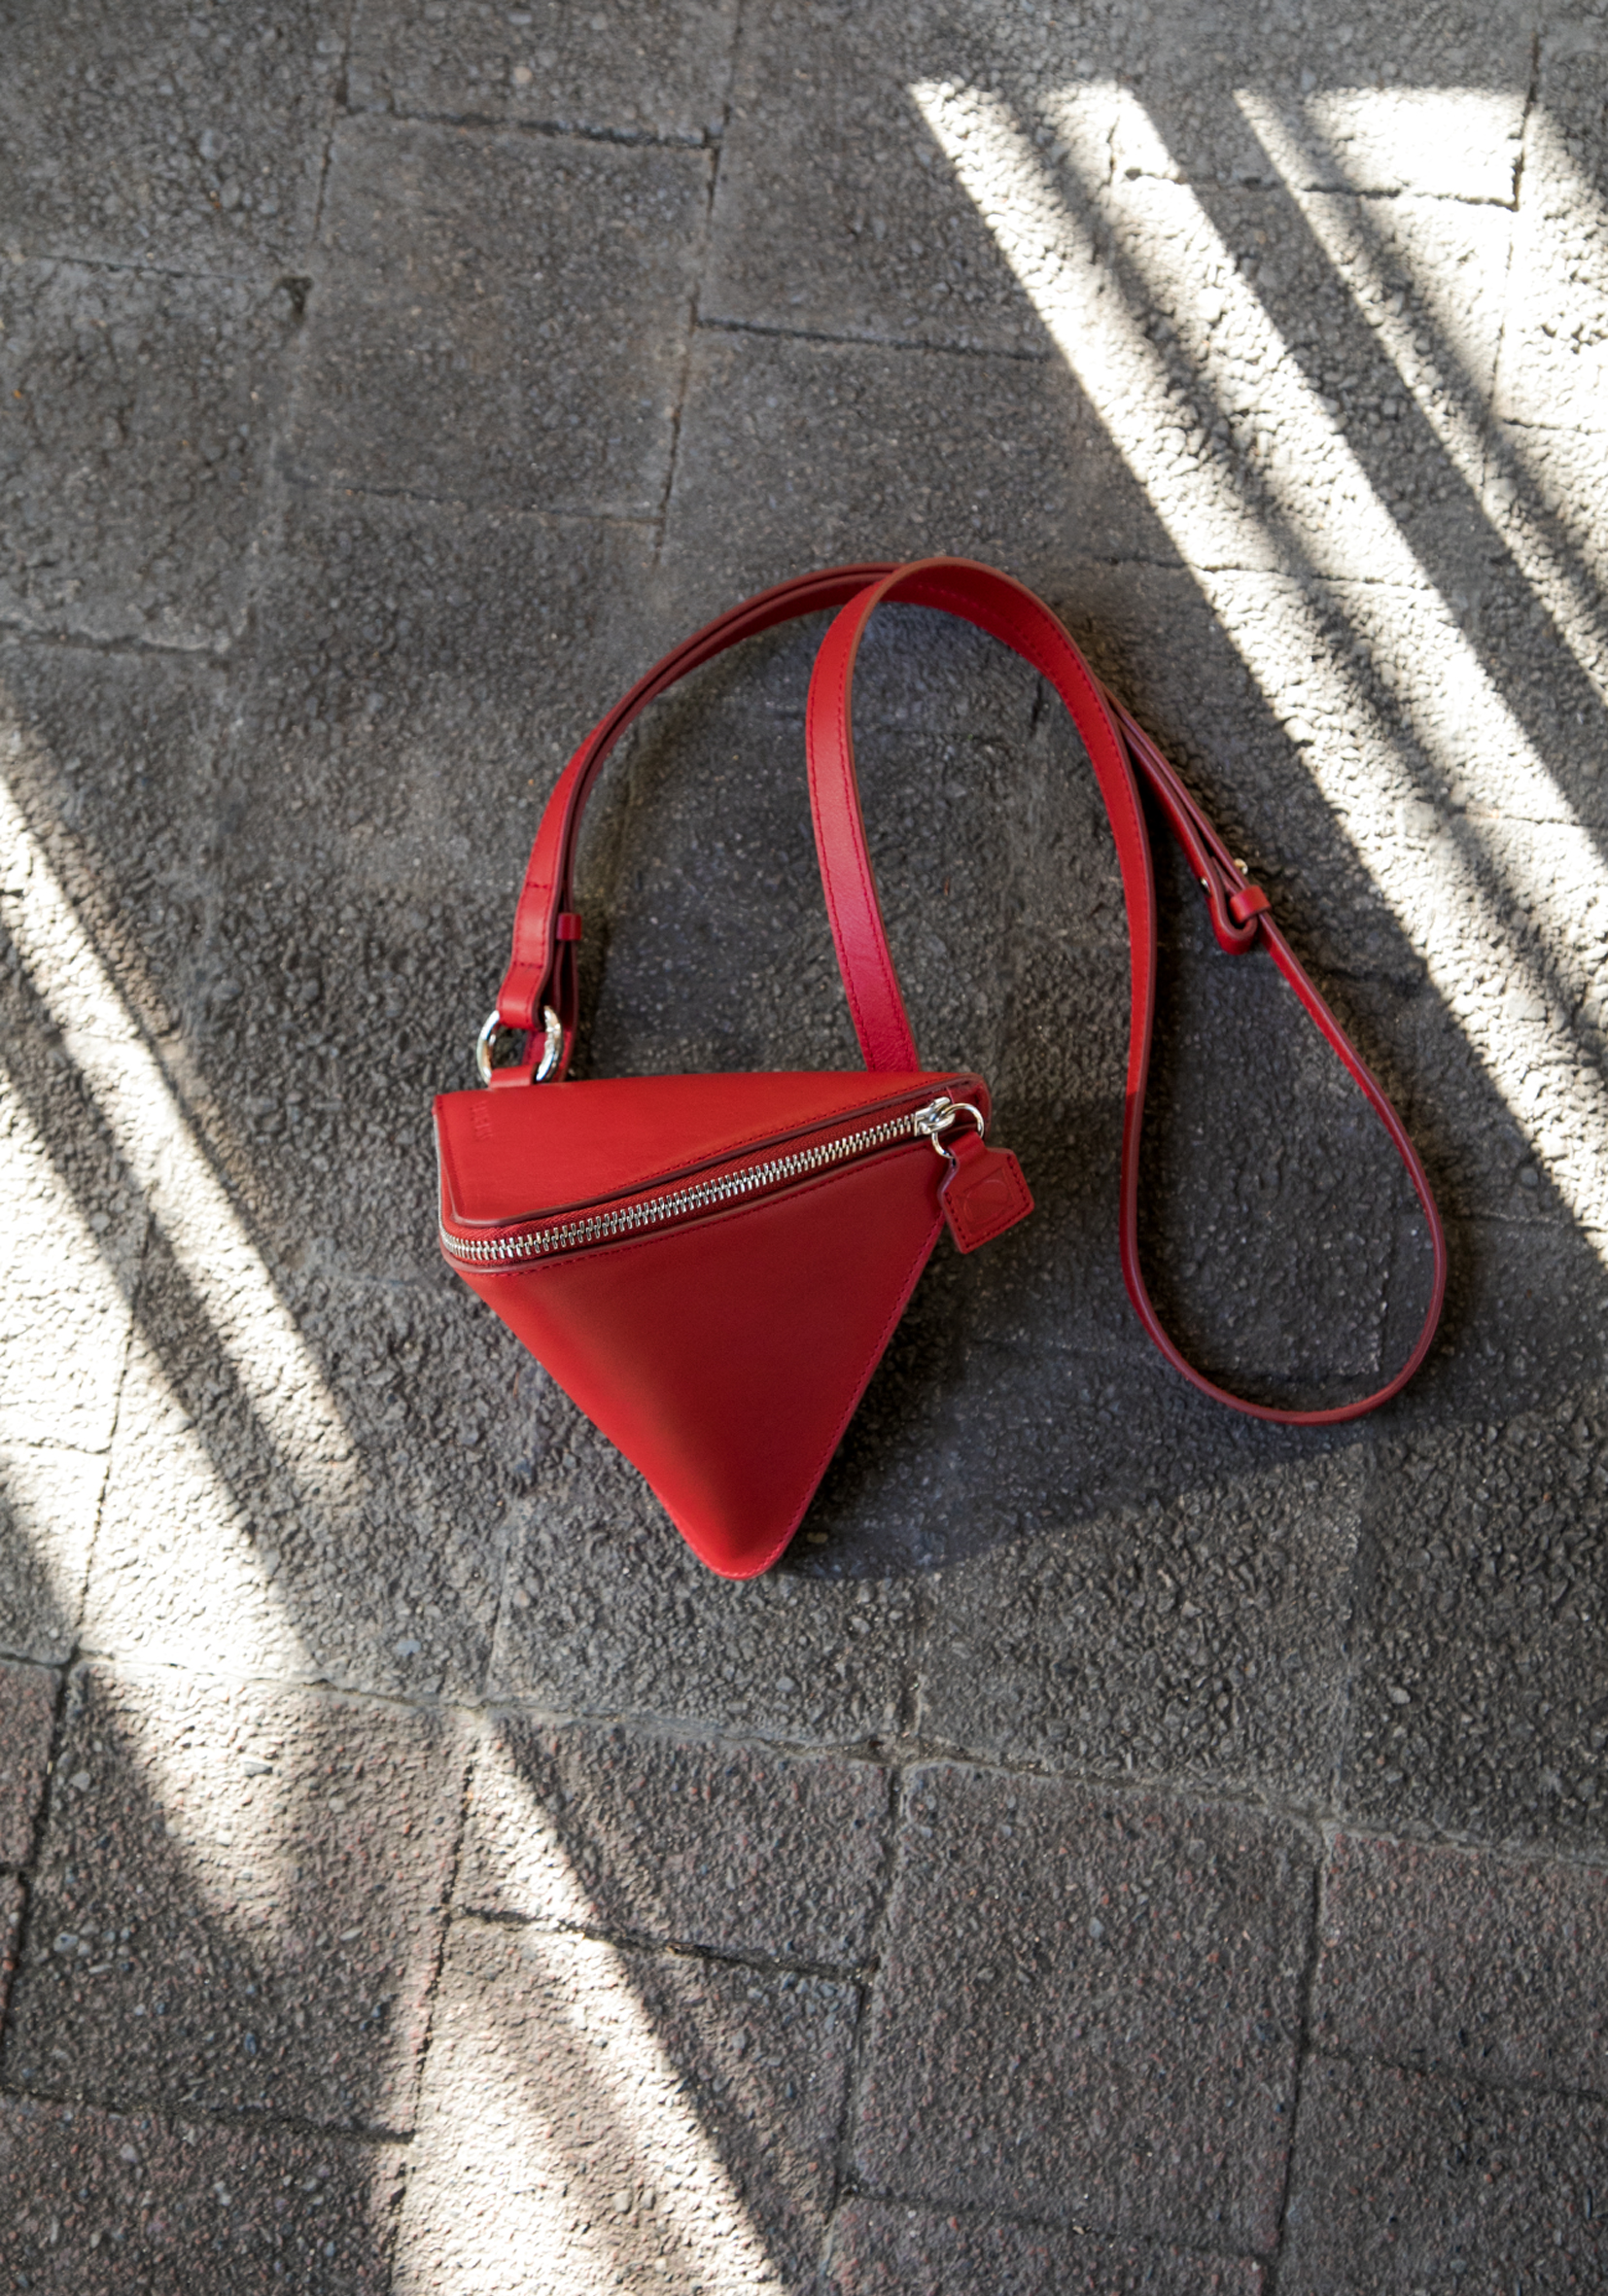 BAURAIN FW18 pythagore crossbody bag